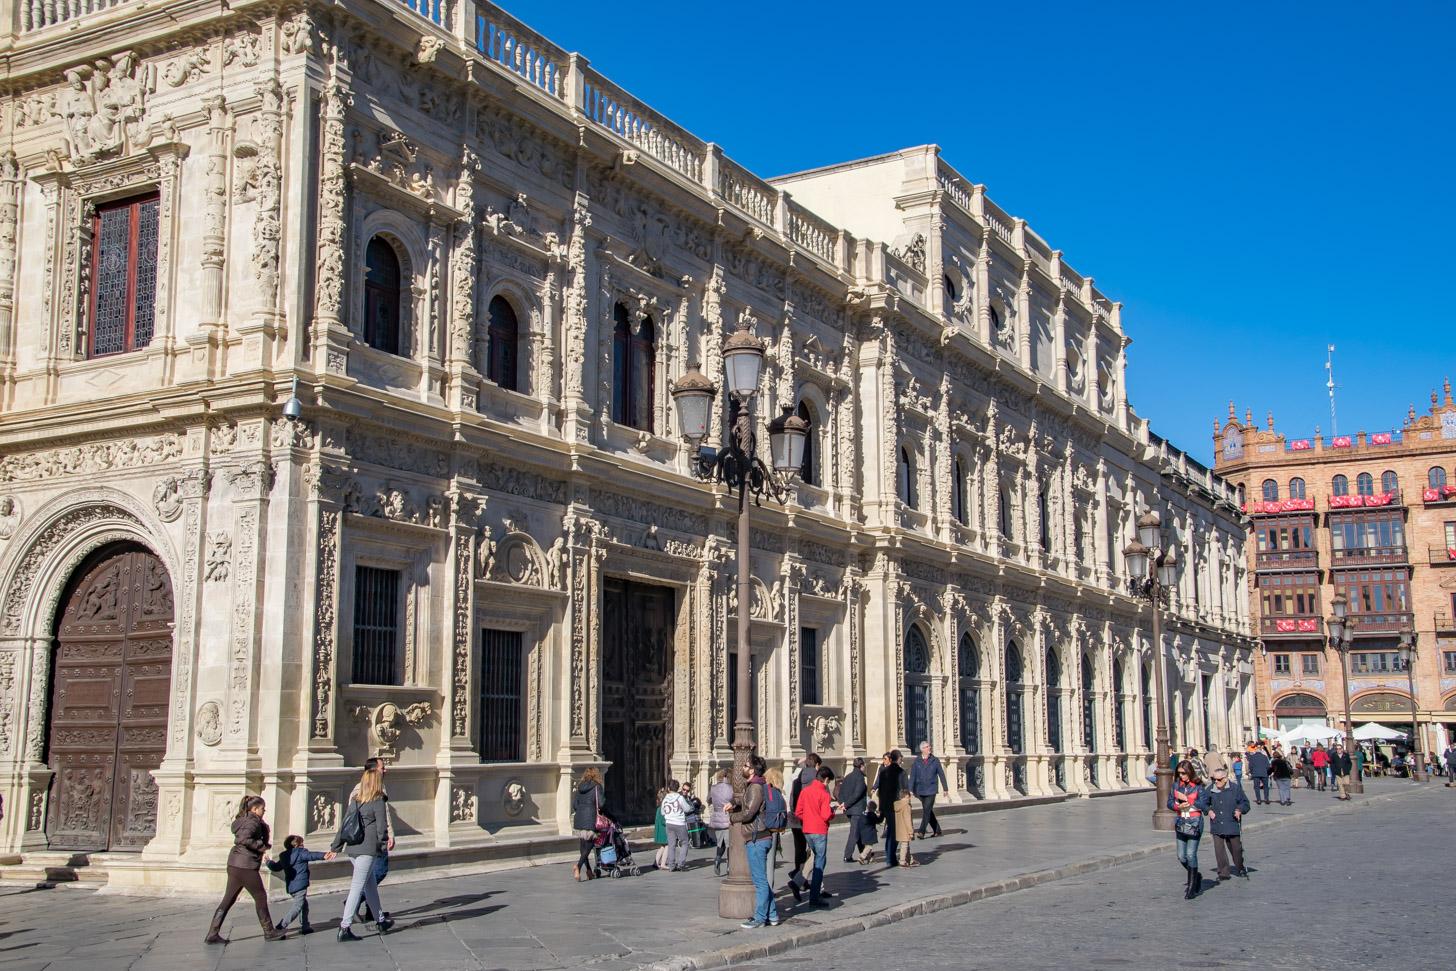 achterkant van het Ayuntamiento de Sevilla